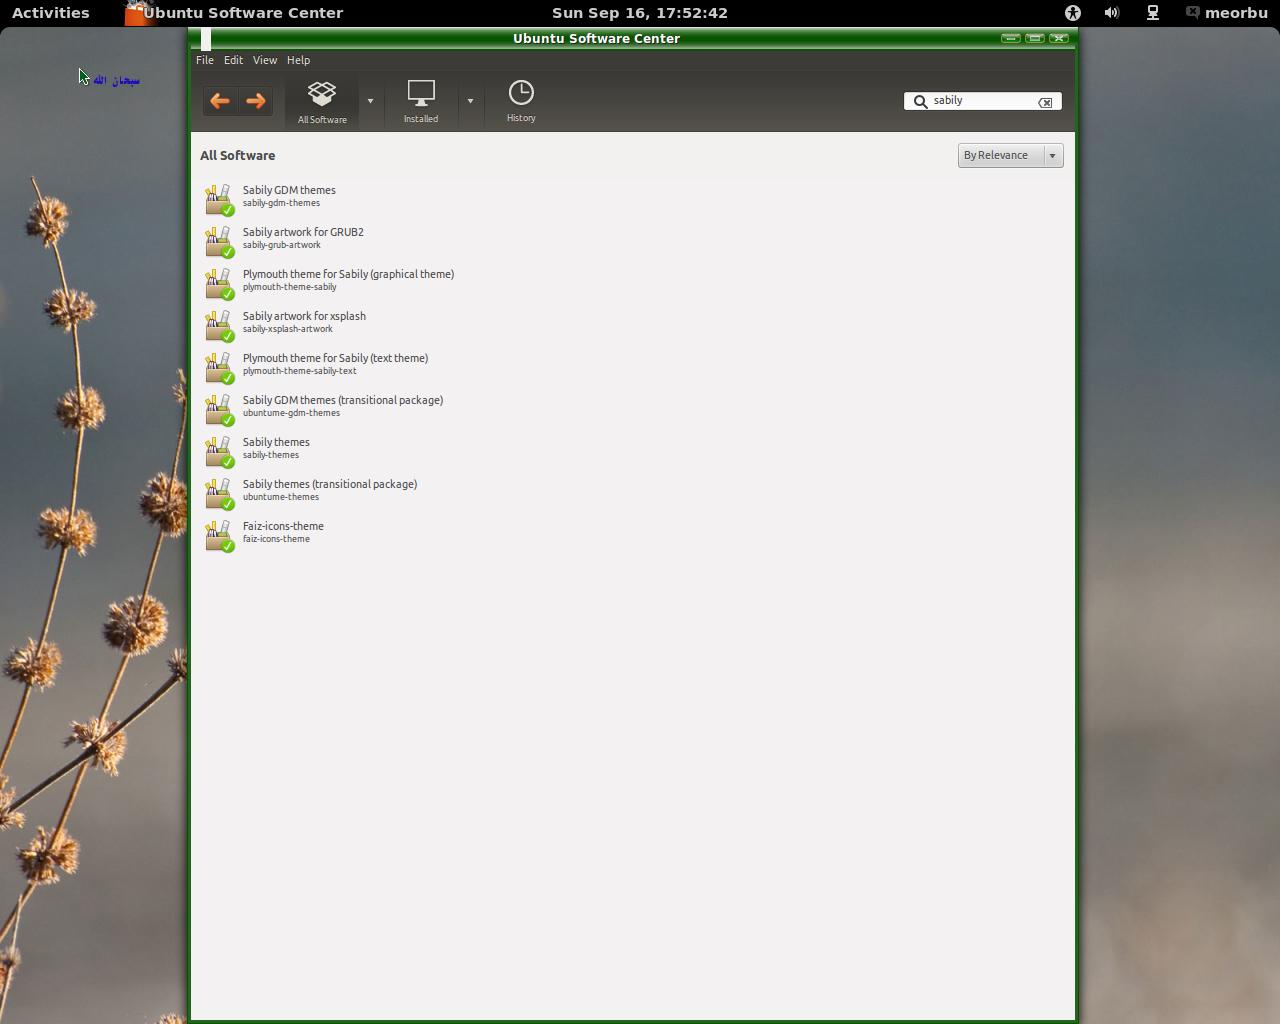 install go ubuntu 12.04